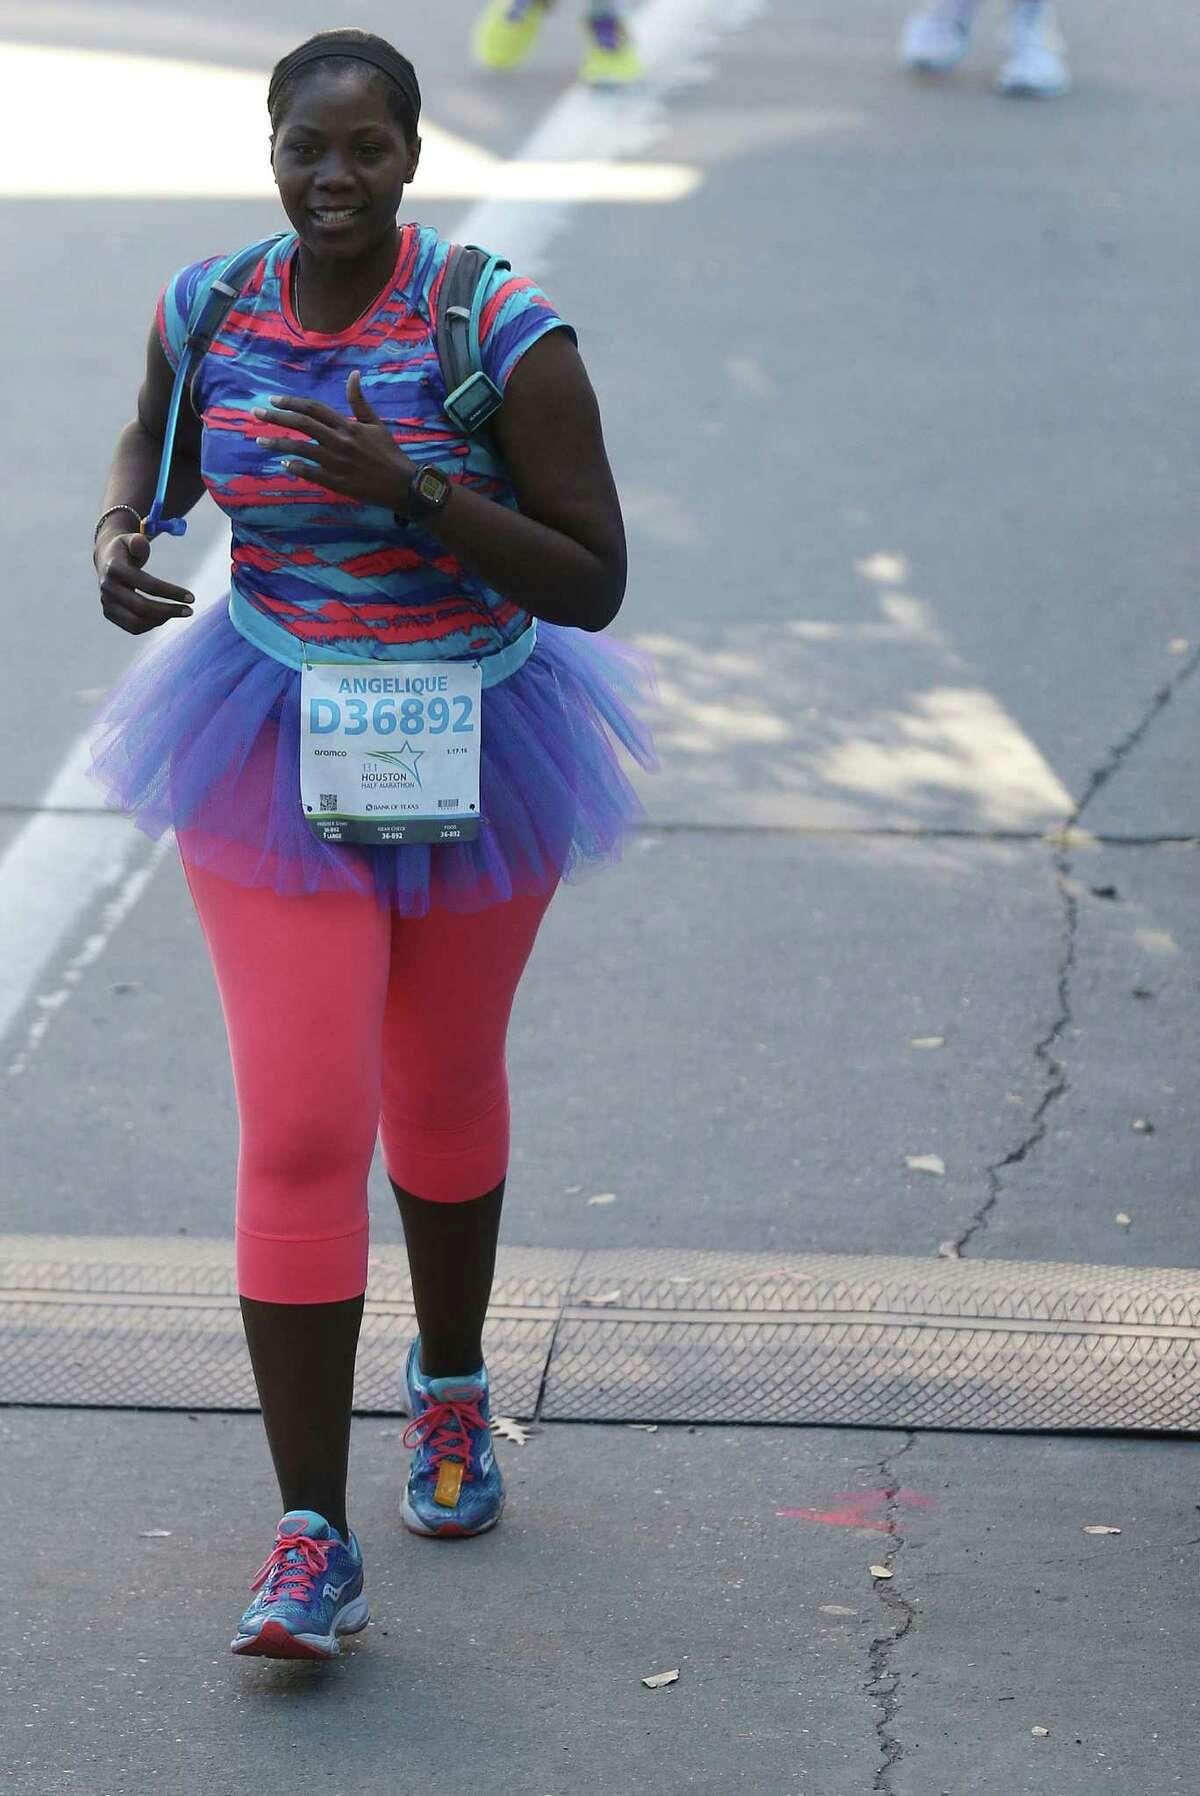 Angelique Woods wears a tutu for her half marathon run on Sunday, Jan. 17, 2016, in Houston.